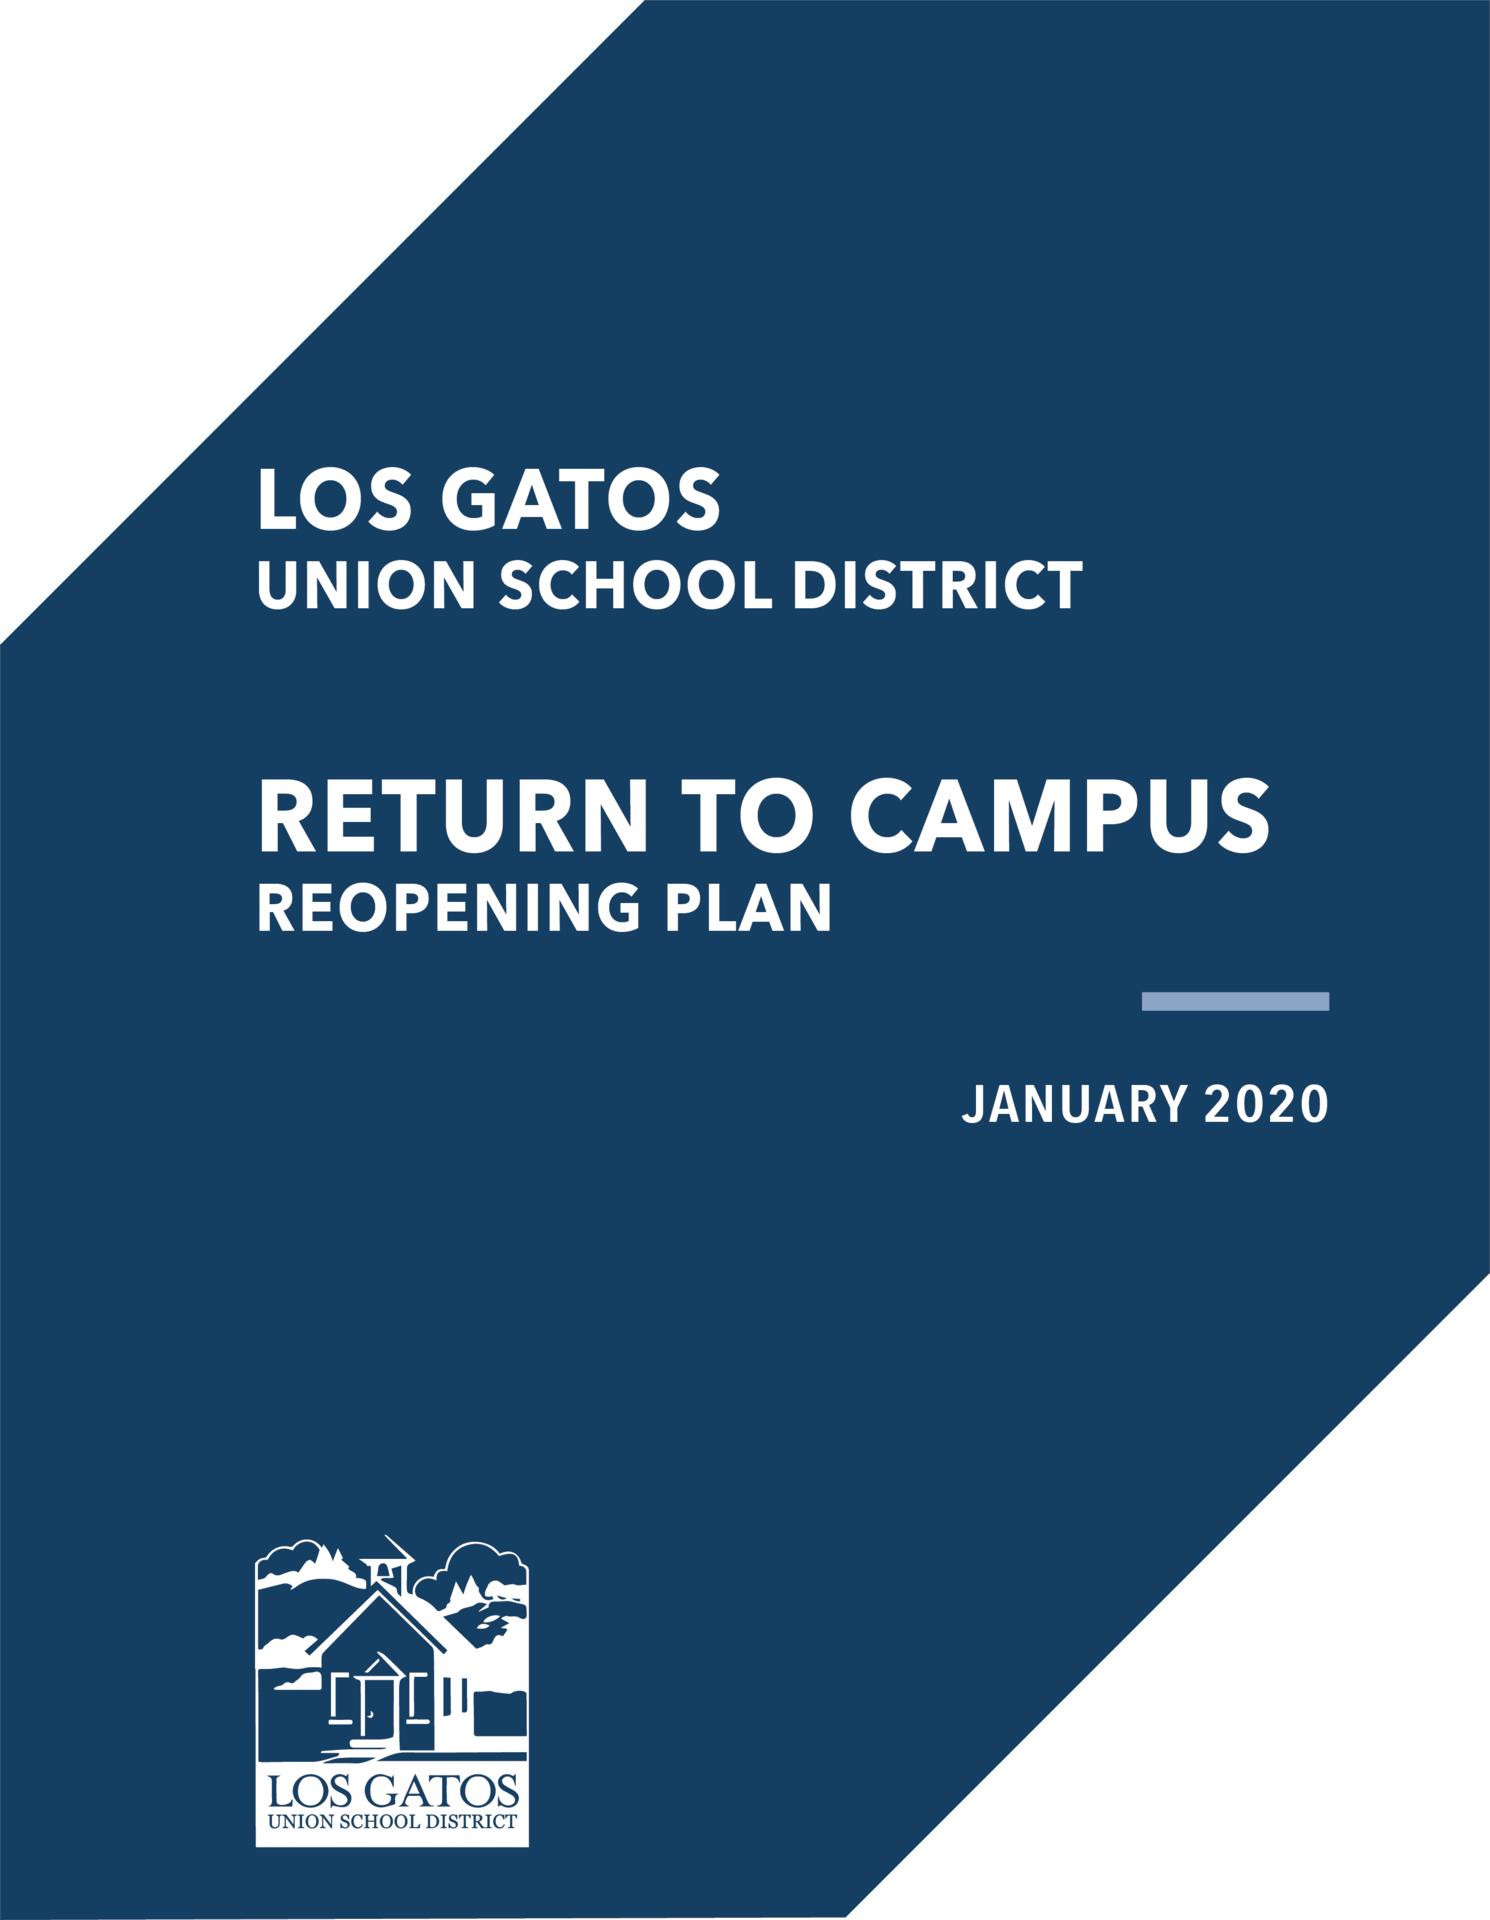 Return Plan Cover